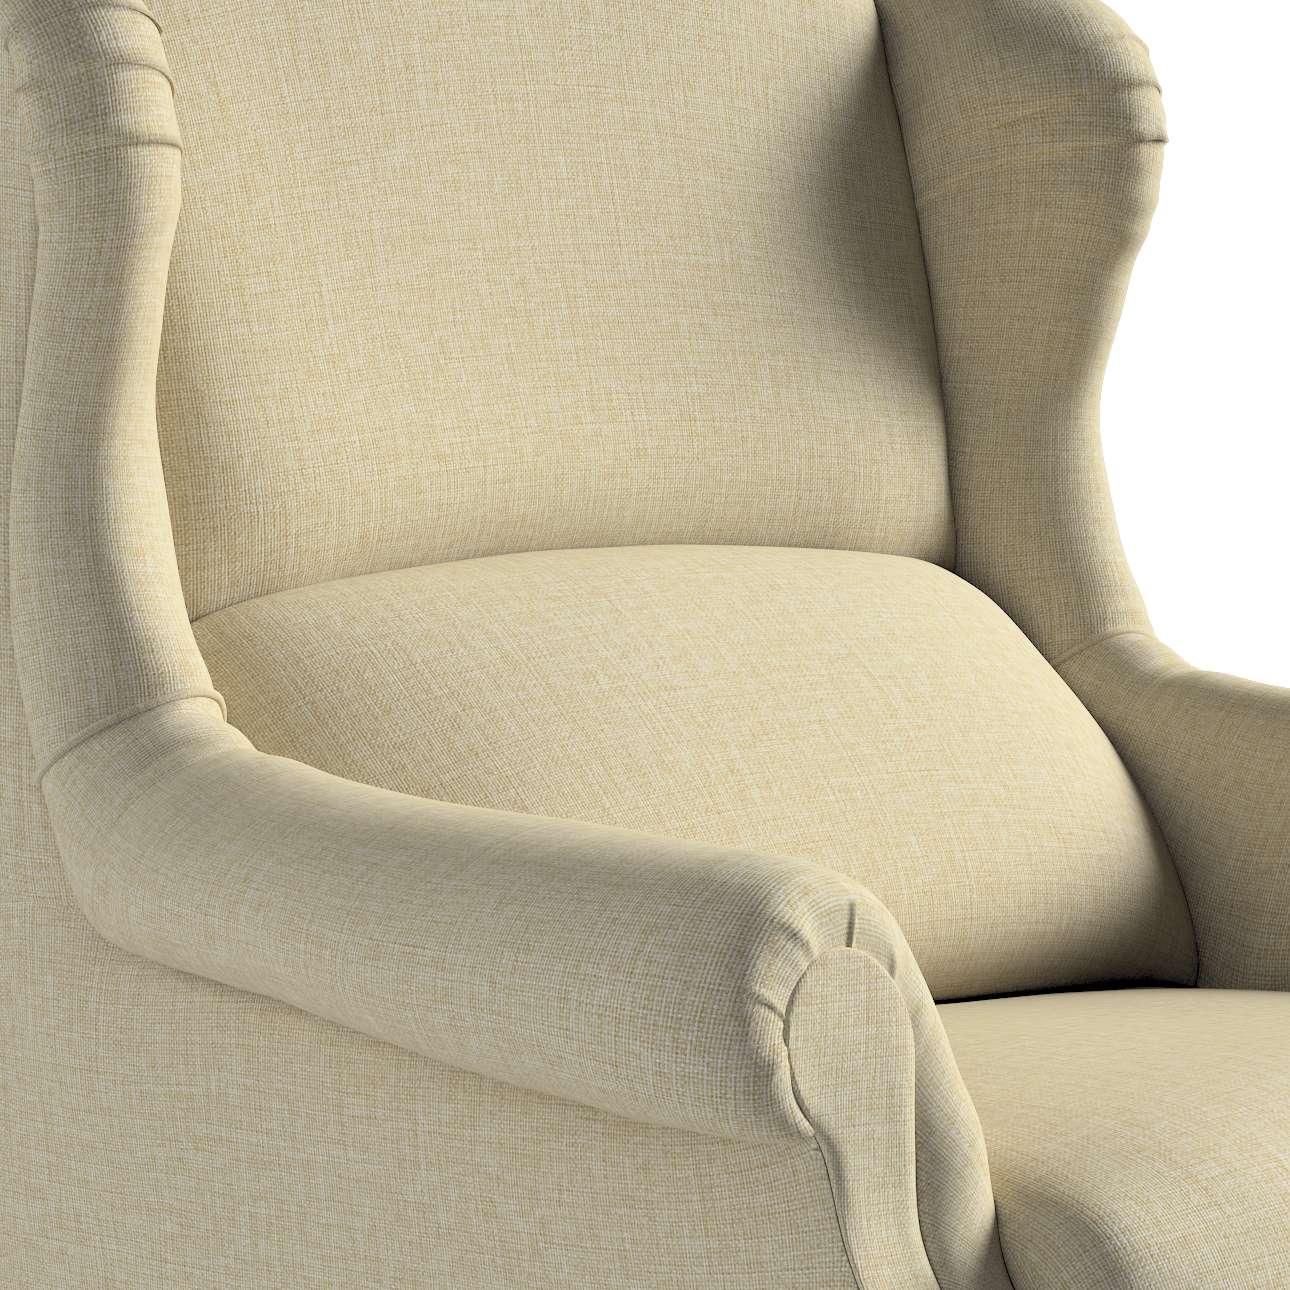 Fotel Unique w kolekcji Living, tkanina: 161-45